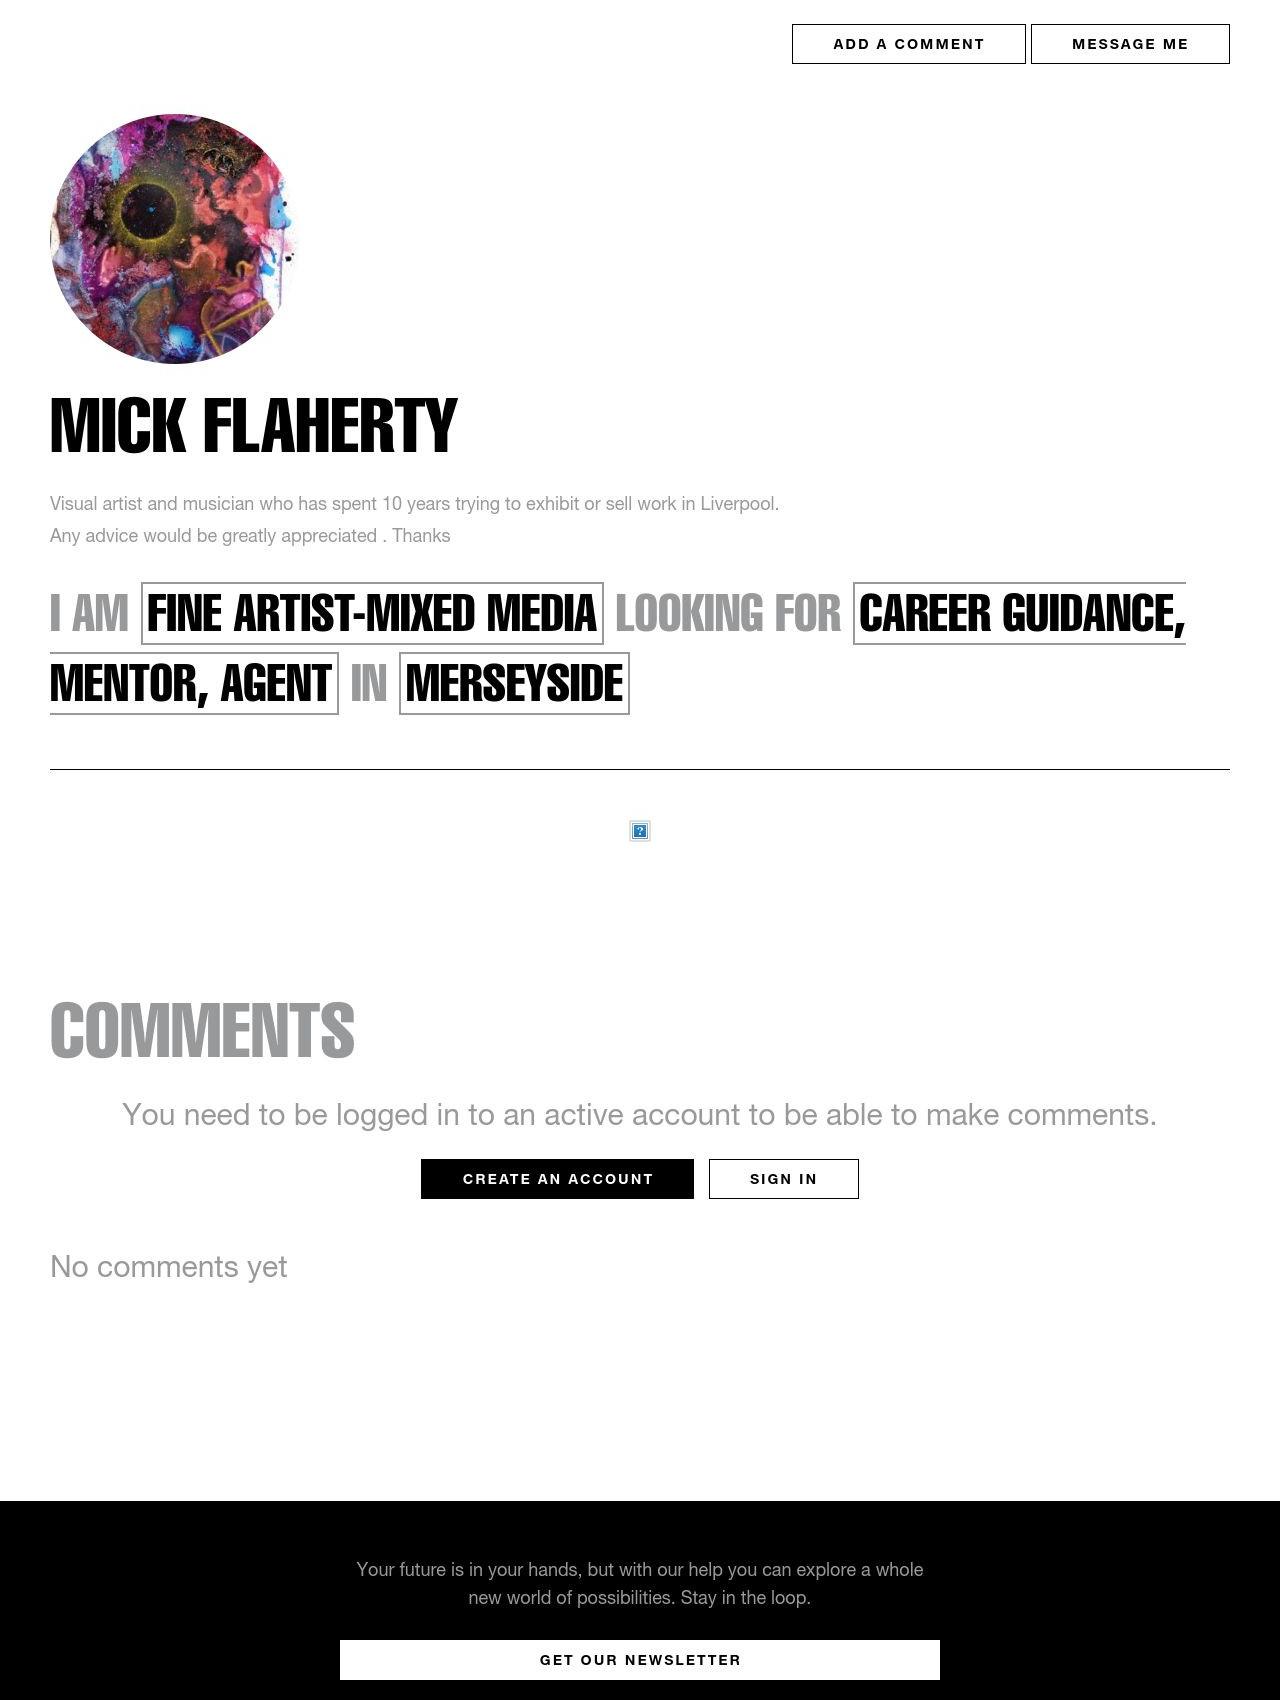 Mick Flaherty